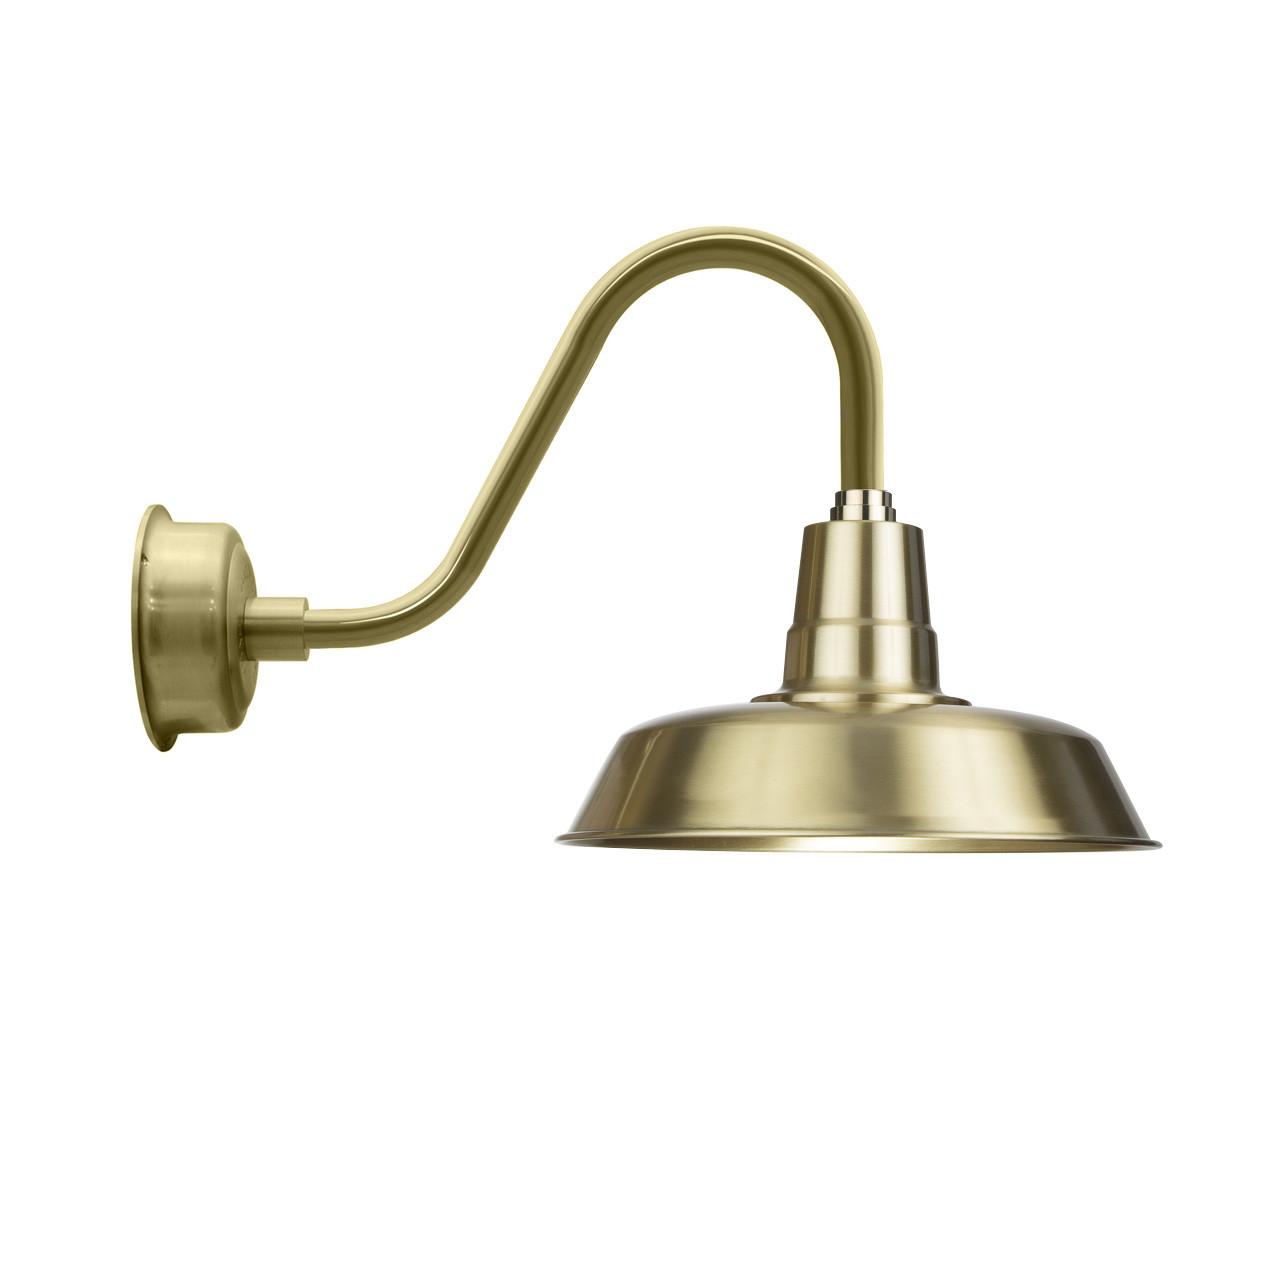 Barn Light 14 Brass With Rustic Gooseneck Arm Cocoweb